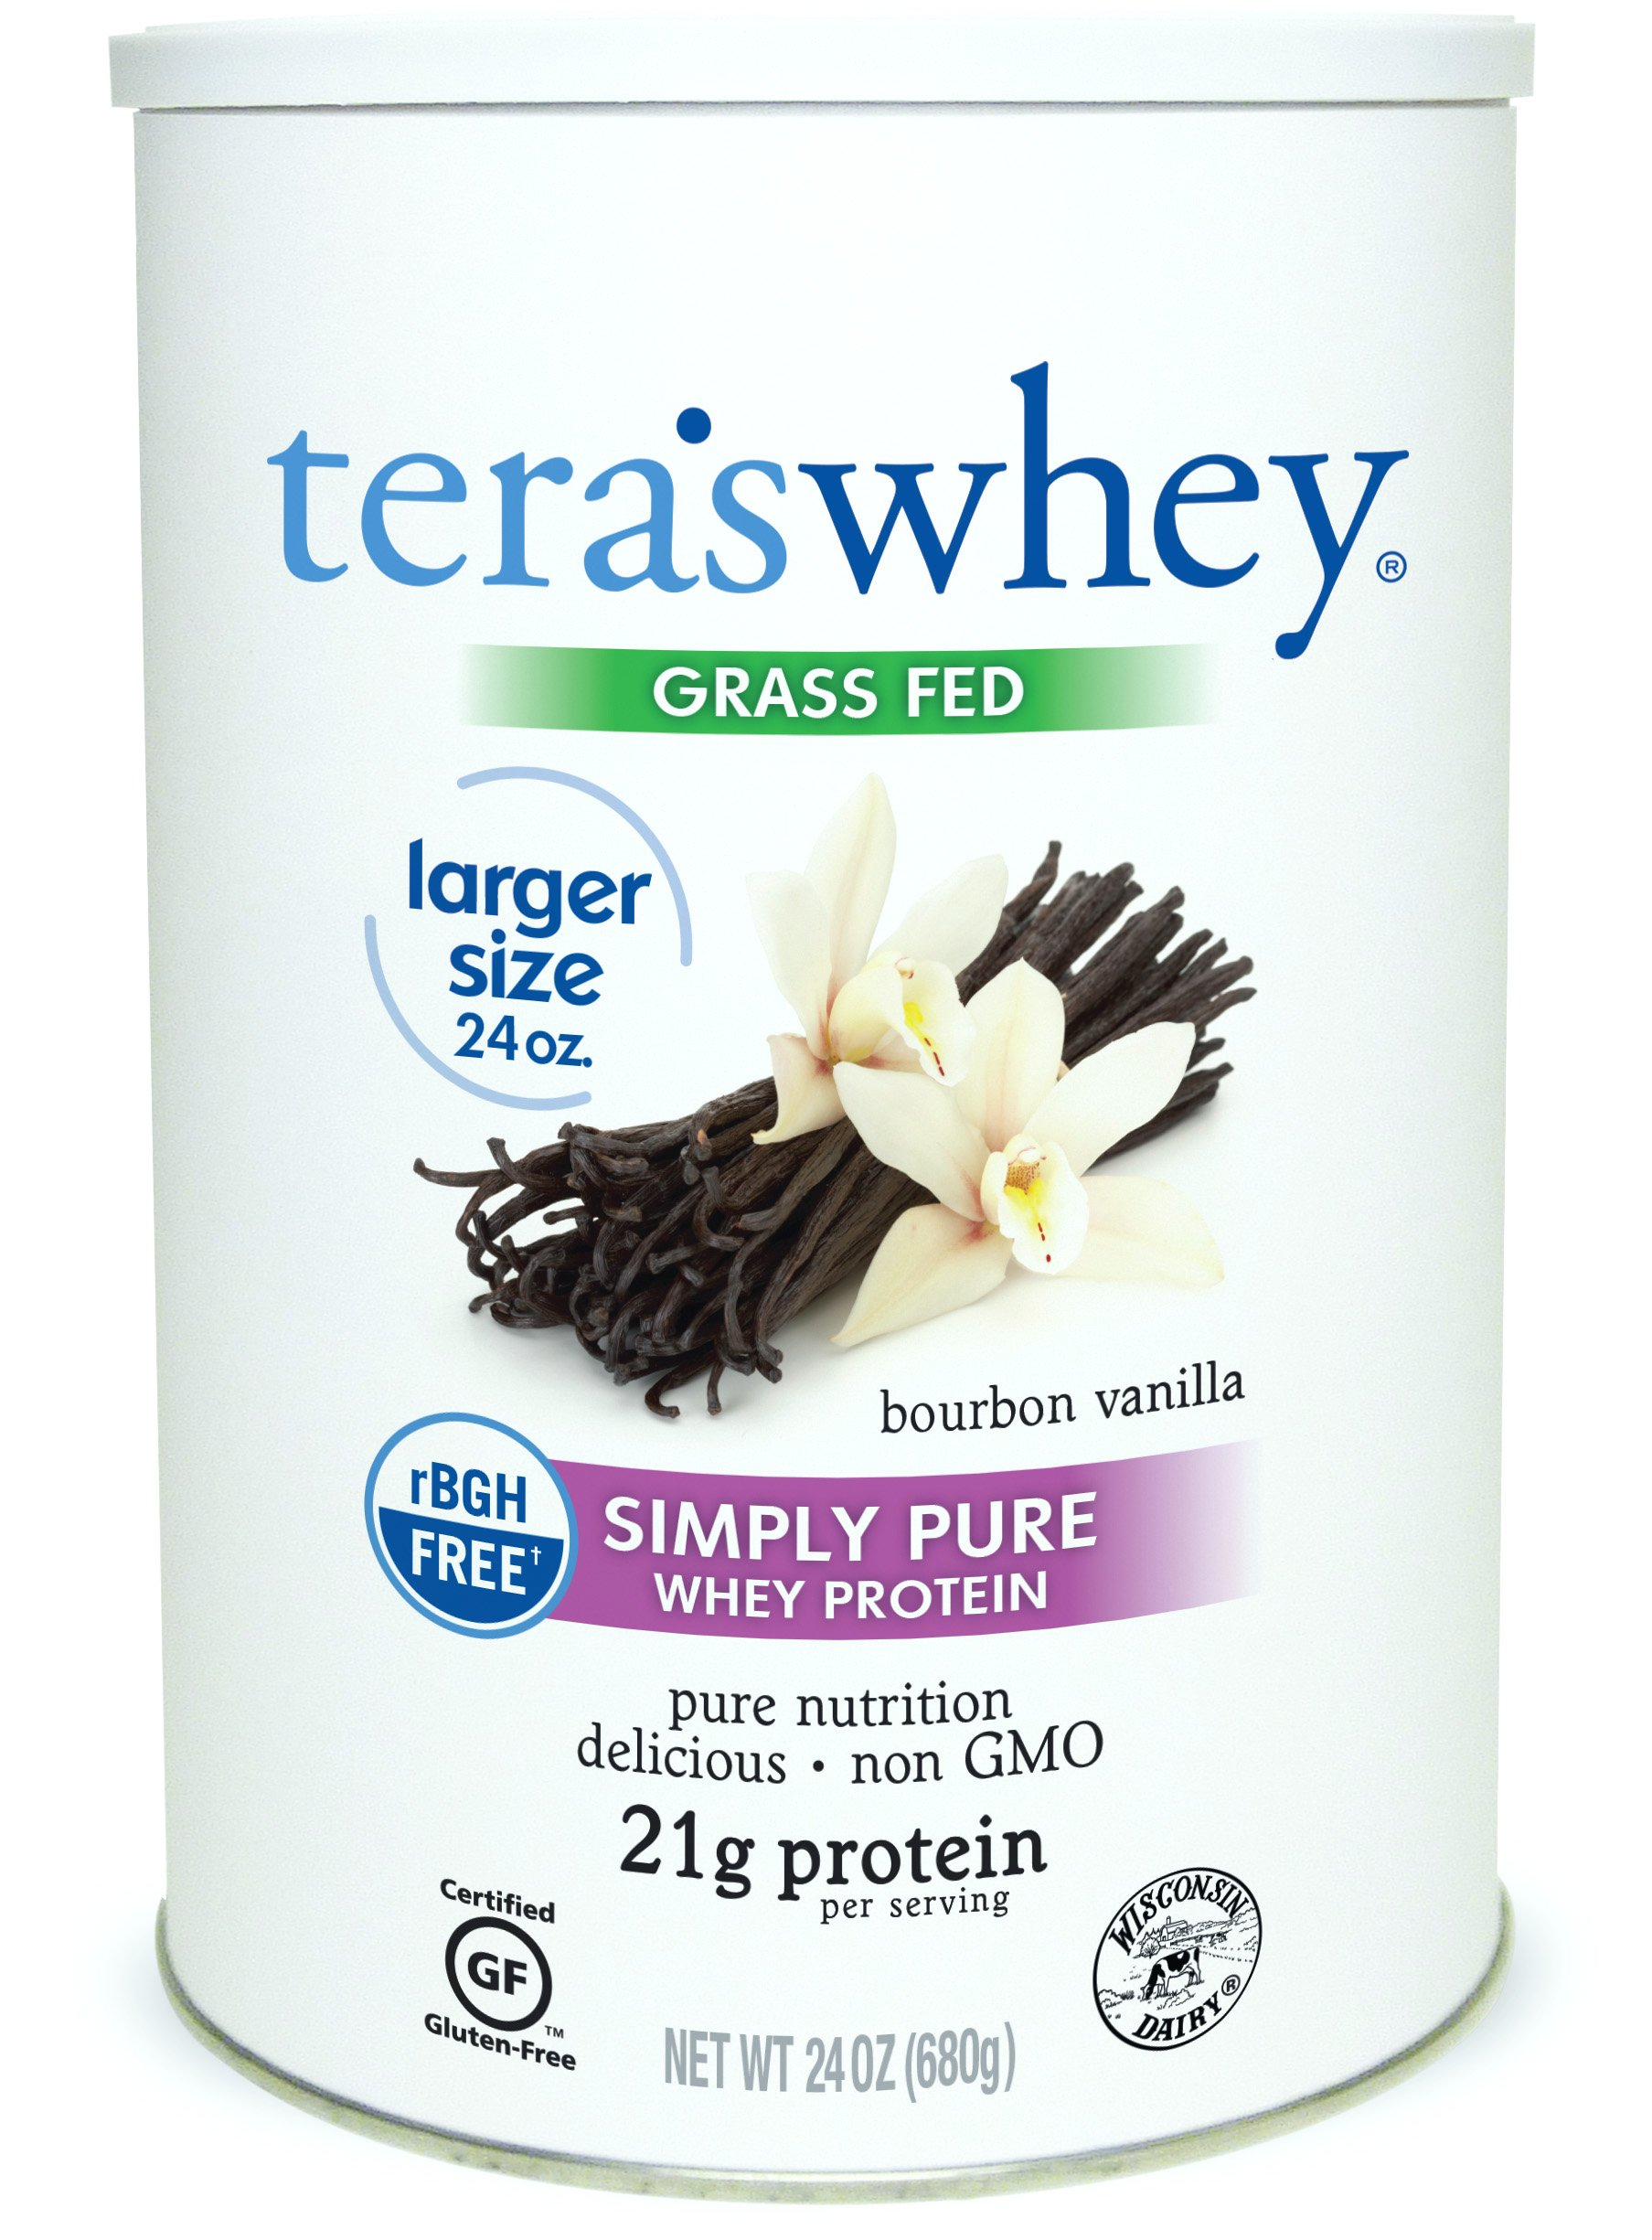 Teraswhey Simply Pure Whey Protein, Bourbon Vanilla, 24 oz